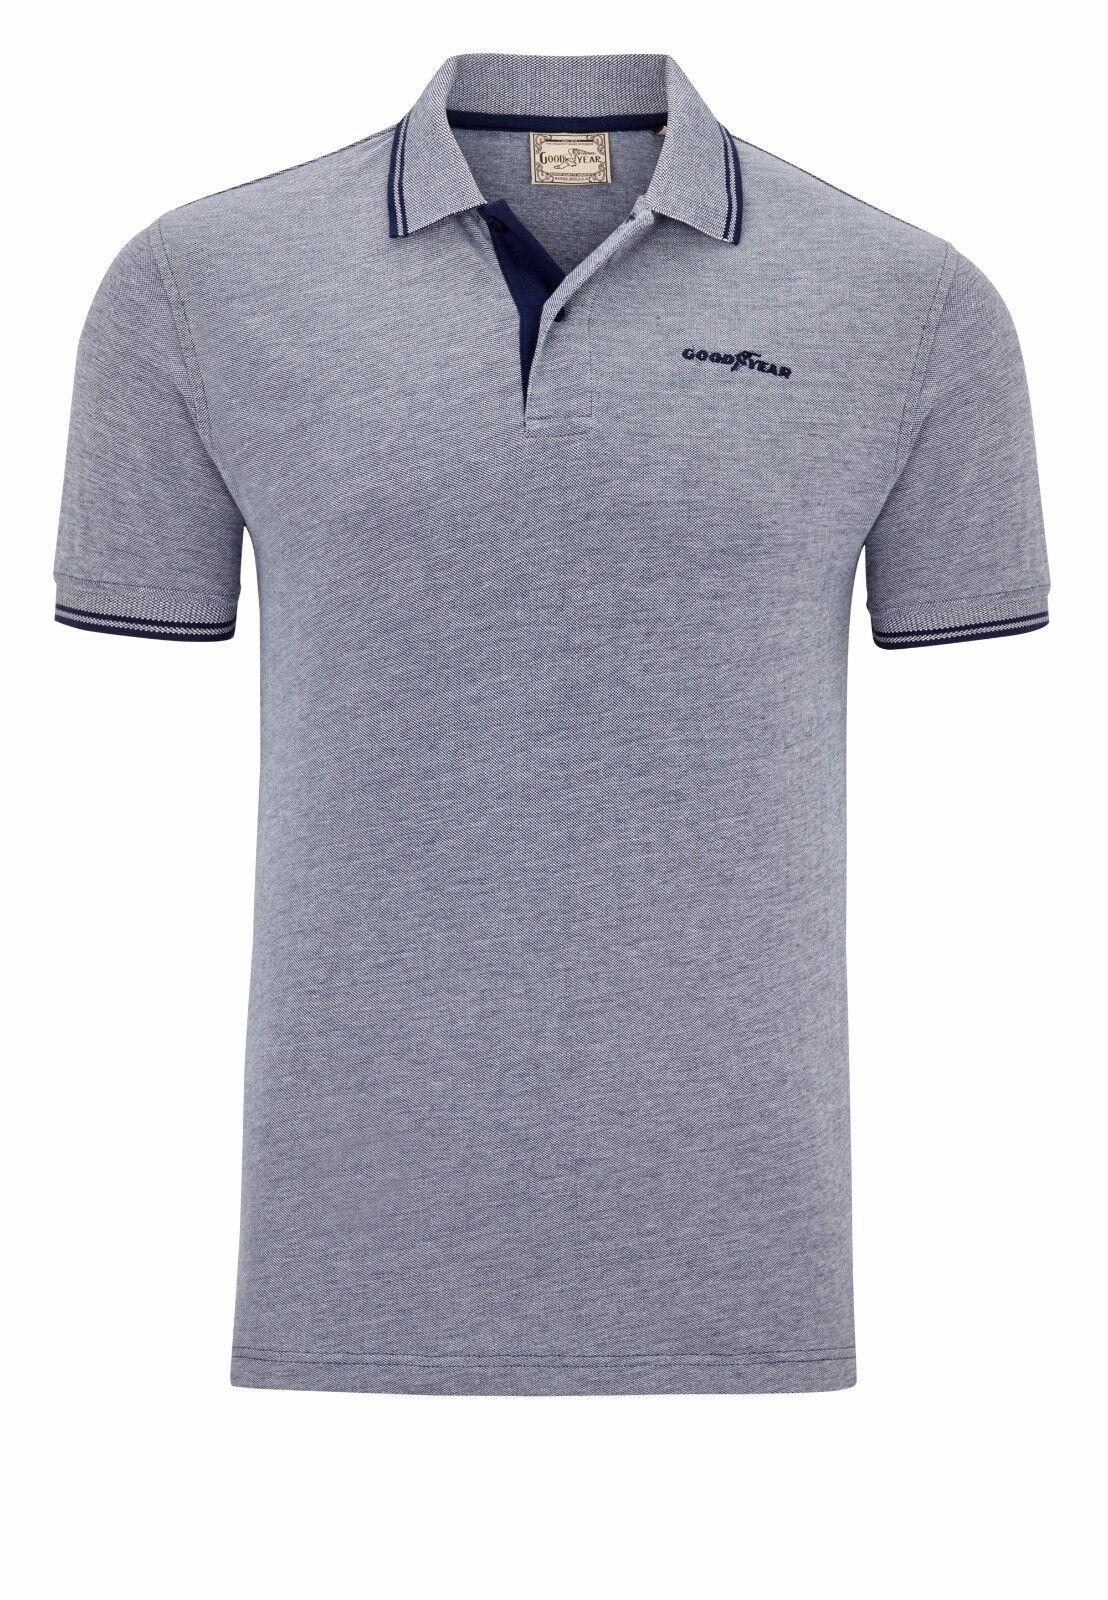 Goodyear Men Sebring Slim Fit Poloshirt